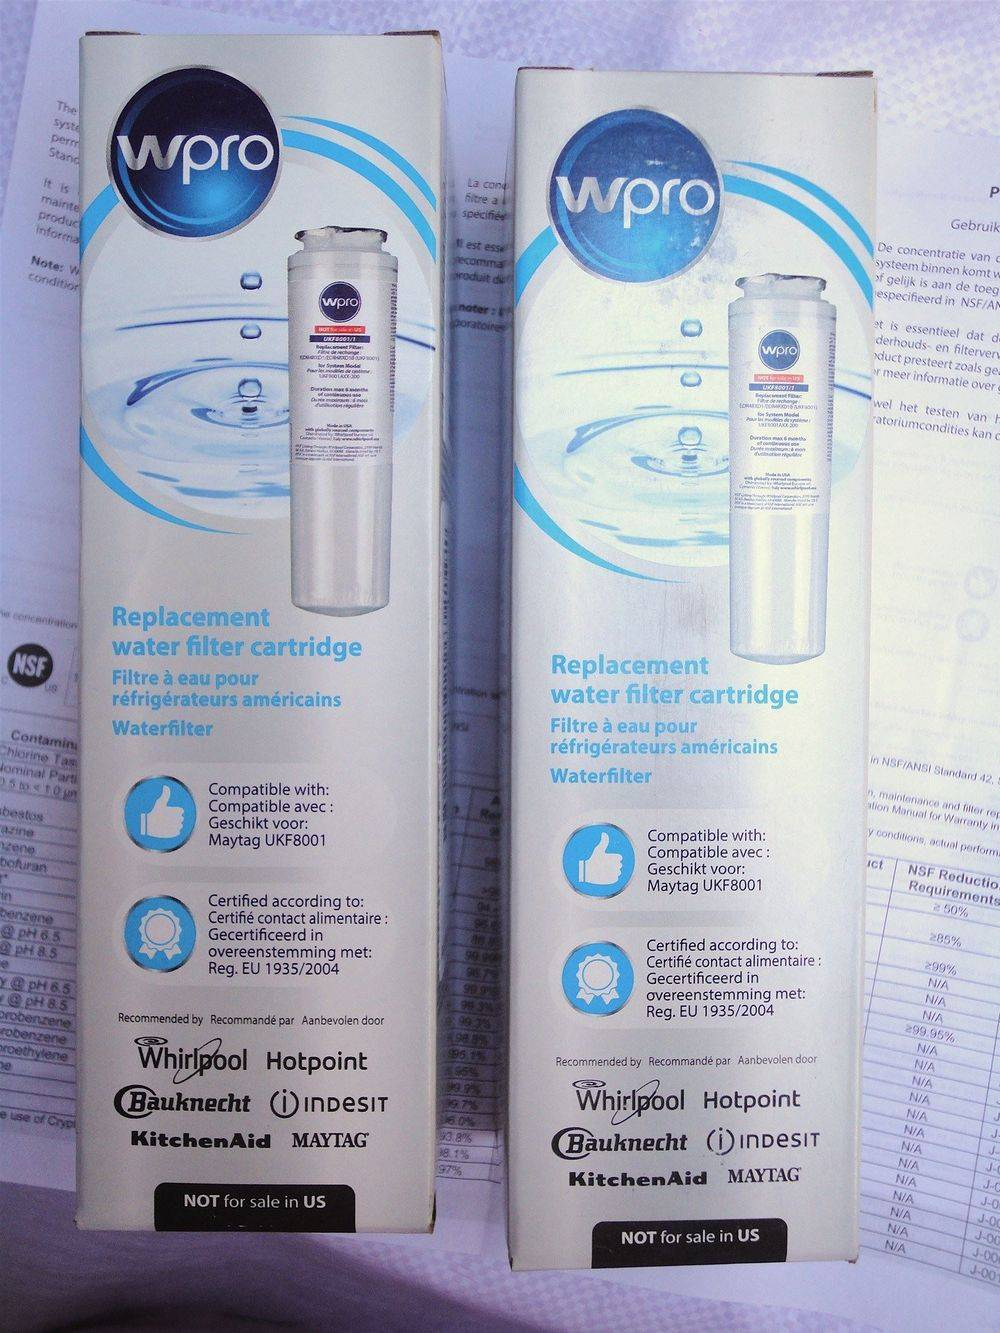 Wpro - Whirlpool - Maytag - Amana - Admiral - Gaggenau - UKF8001 - UKF8001/1 - UKF8001/A - UKF8001/AXX - Filter 4 - replacement internal refrigerator fridge ice water filter cartridge - sold & stocked at www.aaafilterfast.com